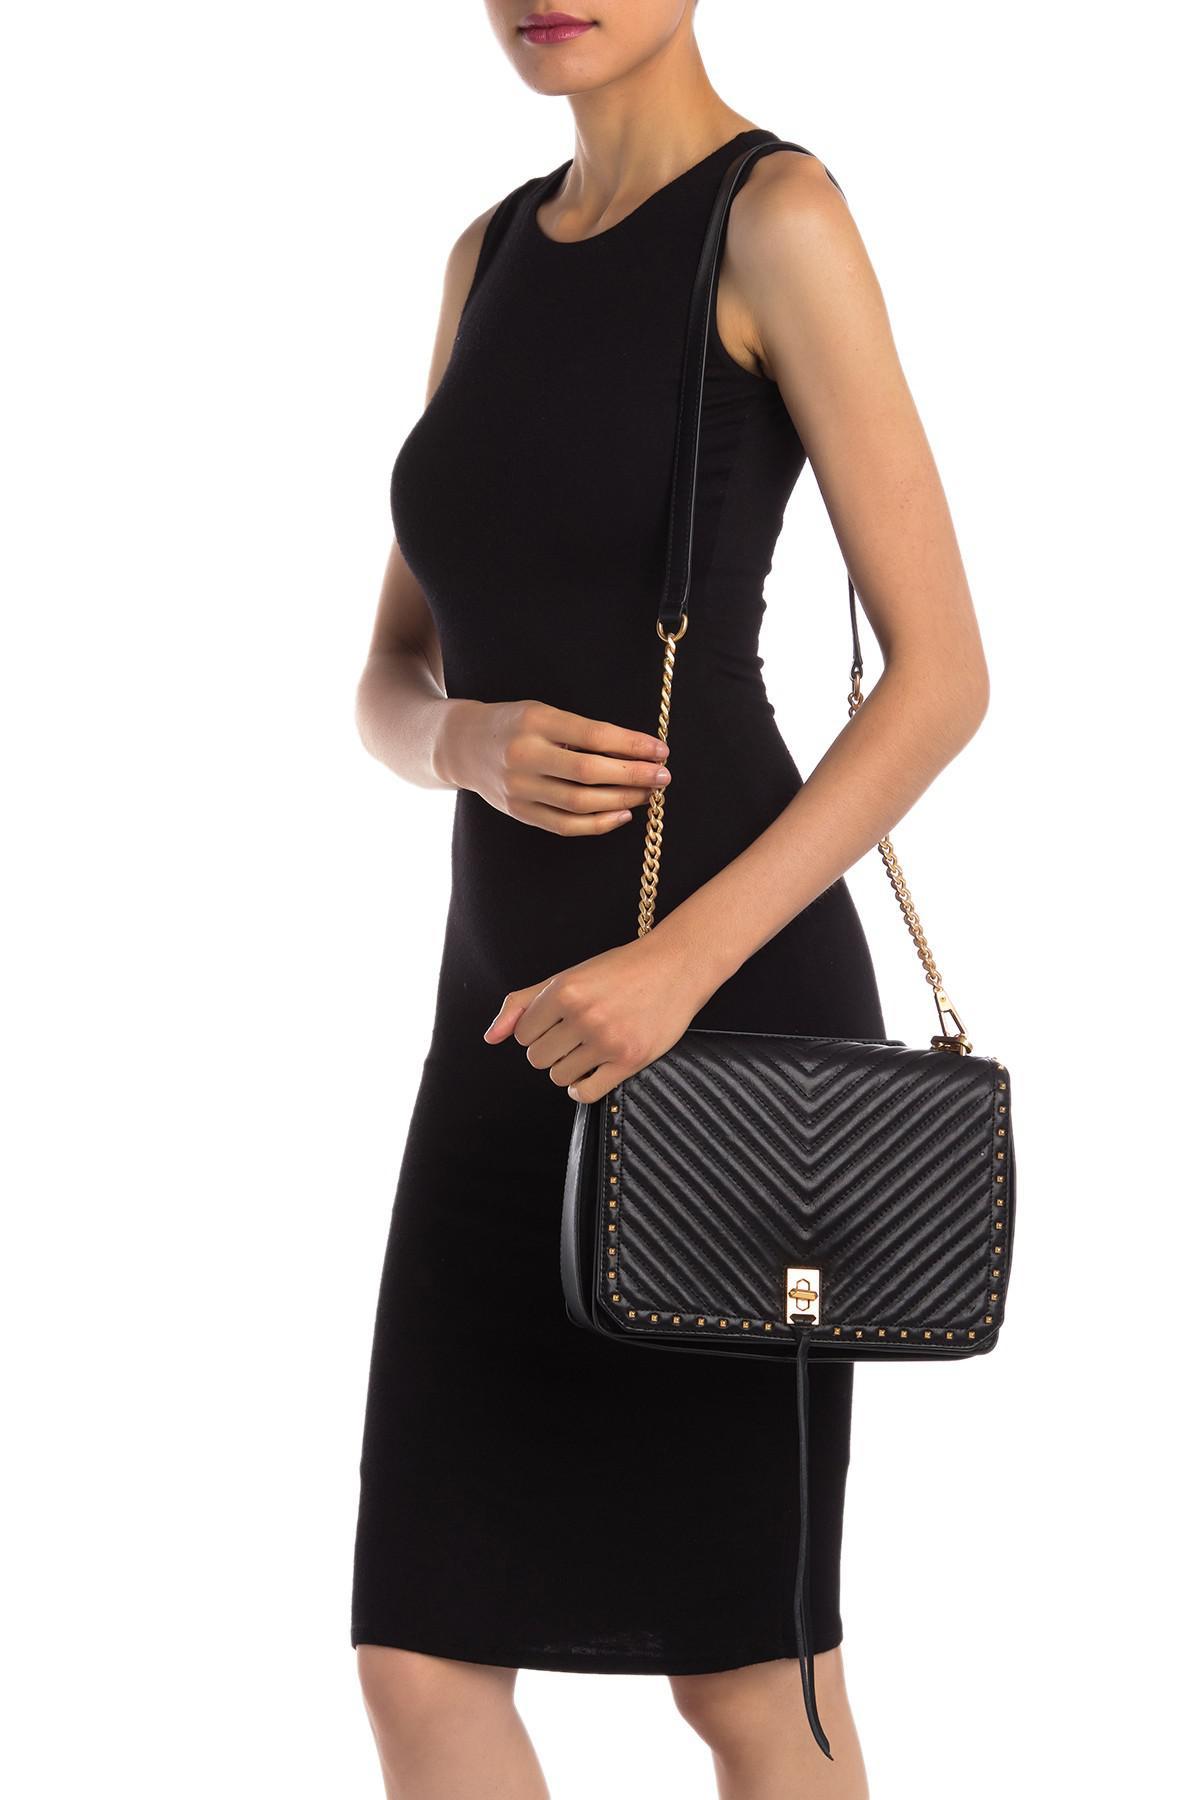 9906983e59 Lyst - Rebecca Minkoff Medium Becky Leather Shoulder Bag in Black